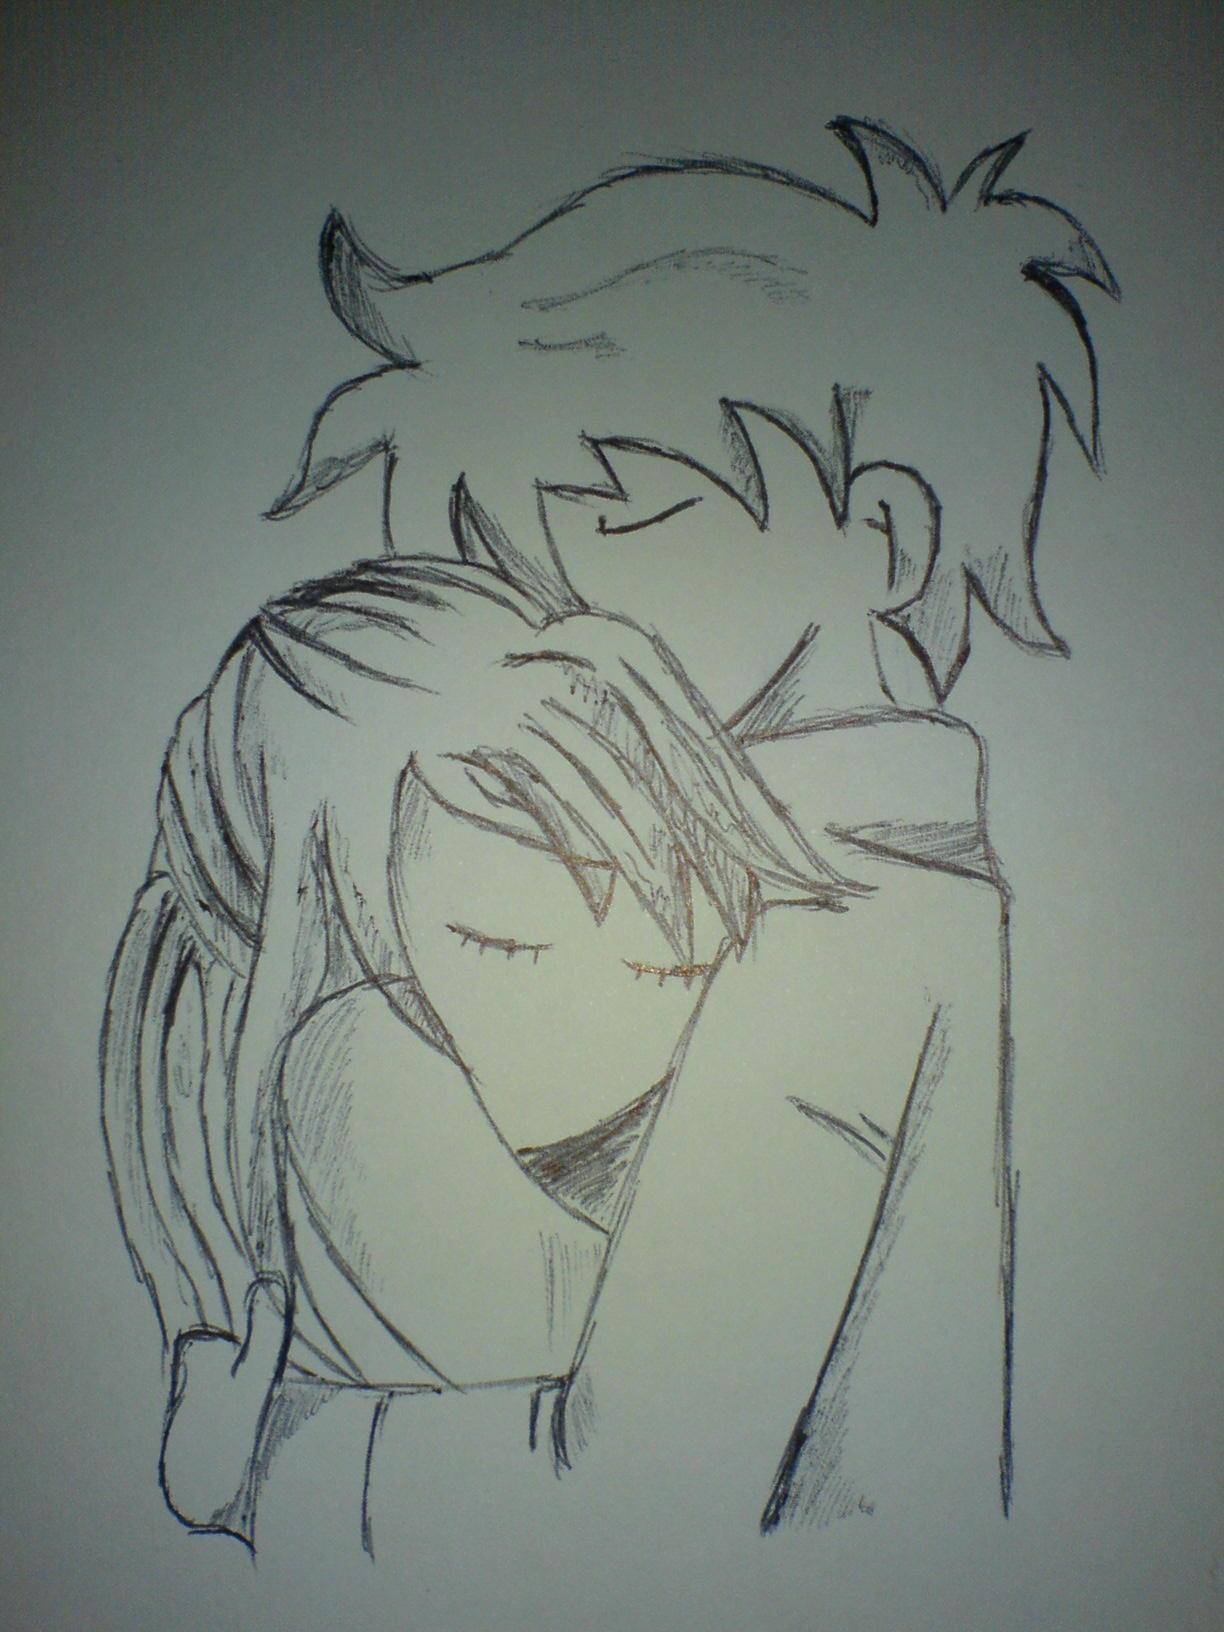 Boy and Girl cute hug 2007 by manolos69 on DeviantArt